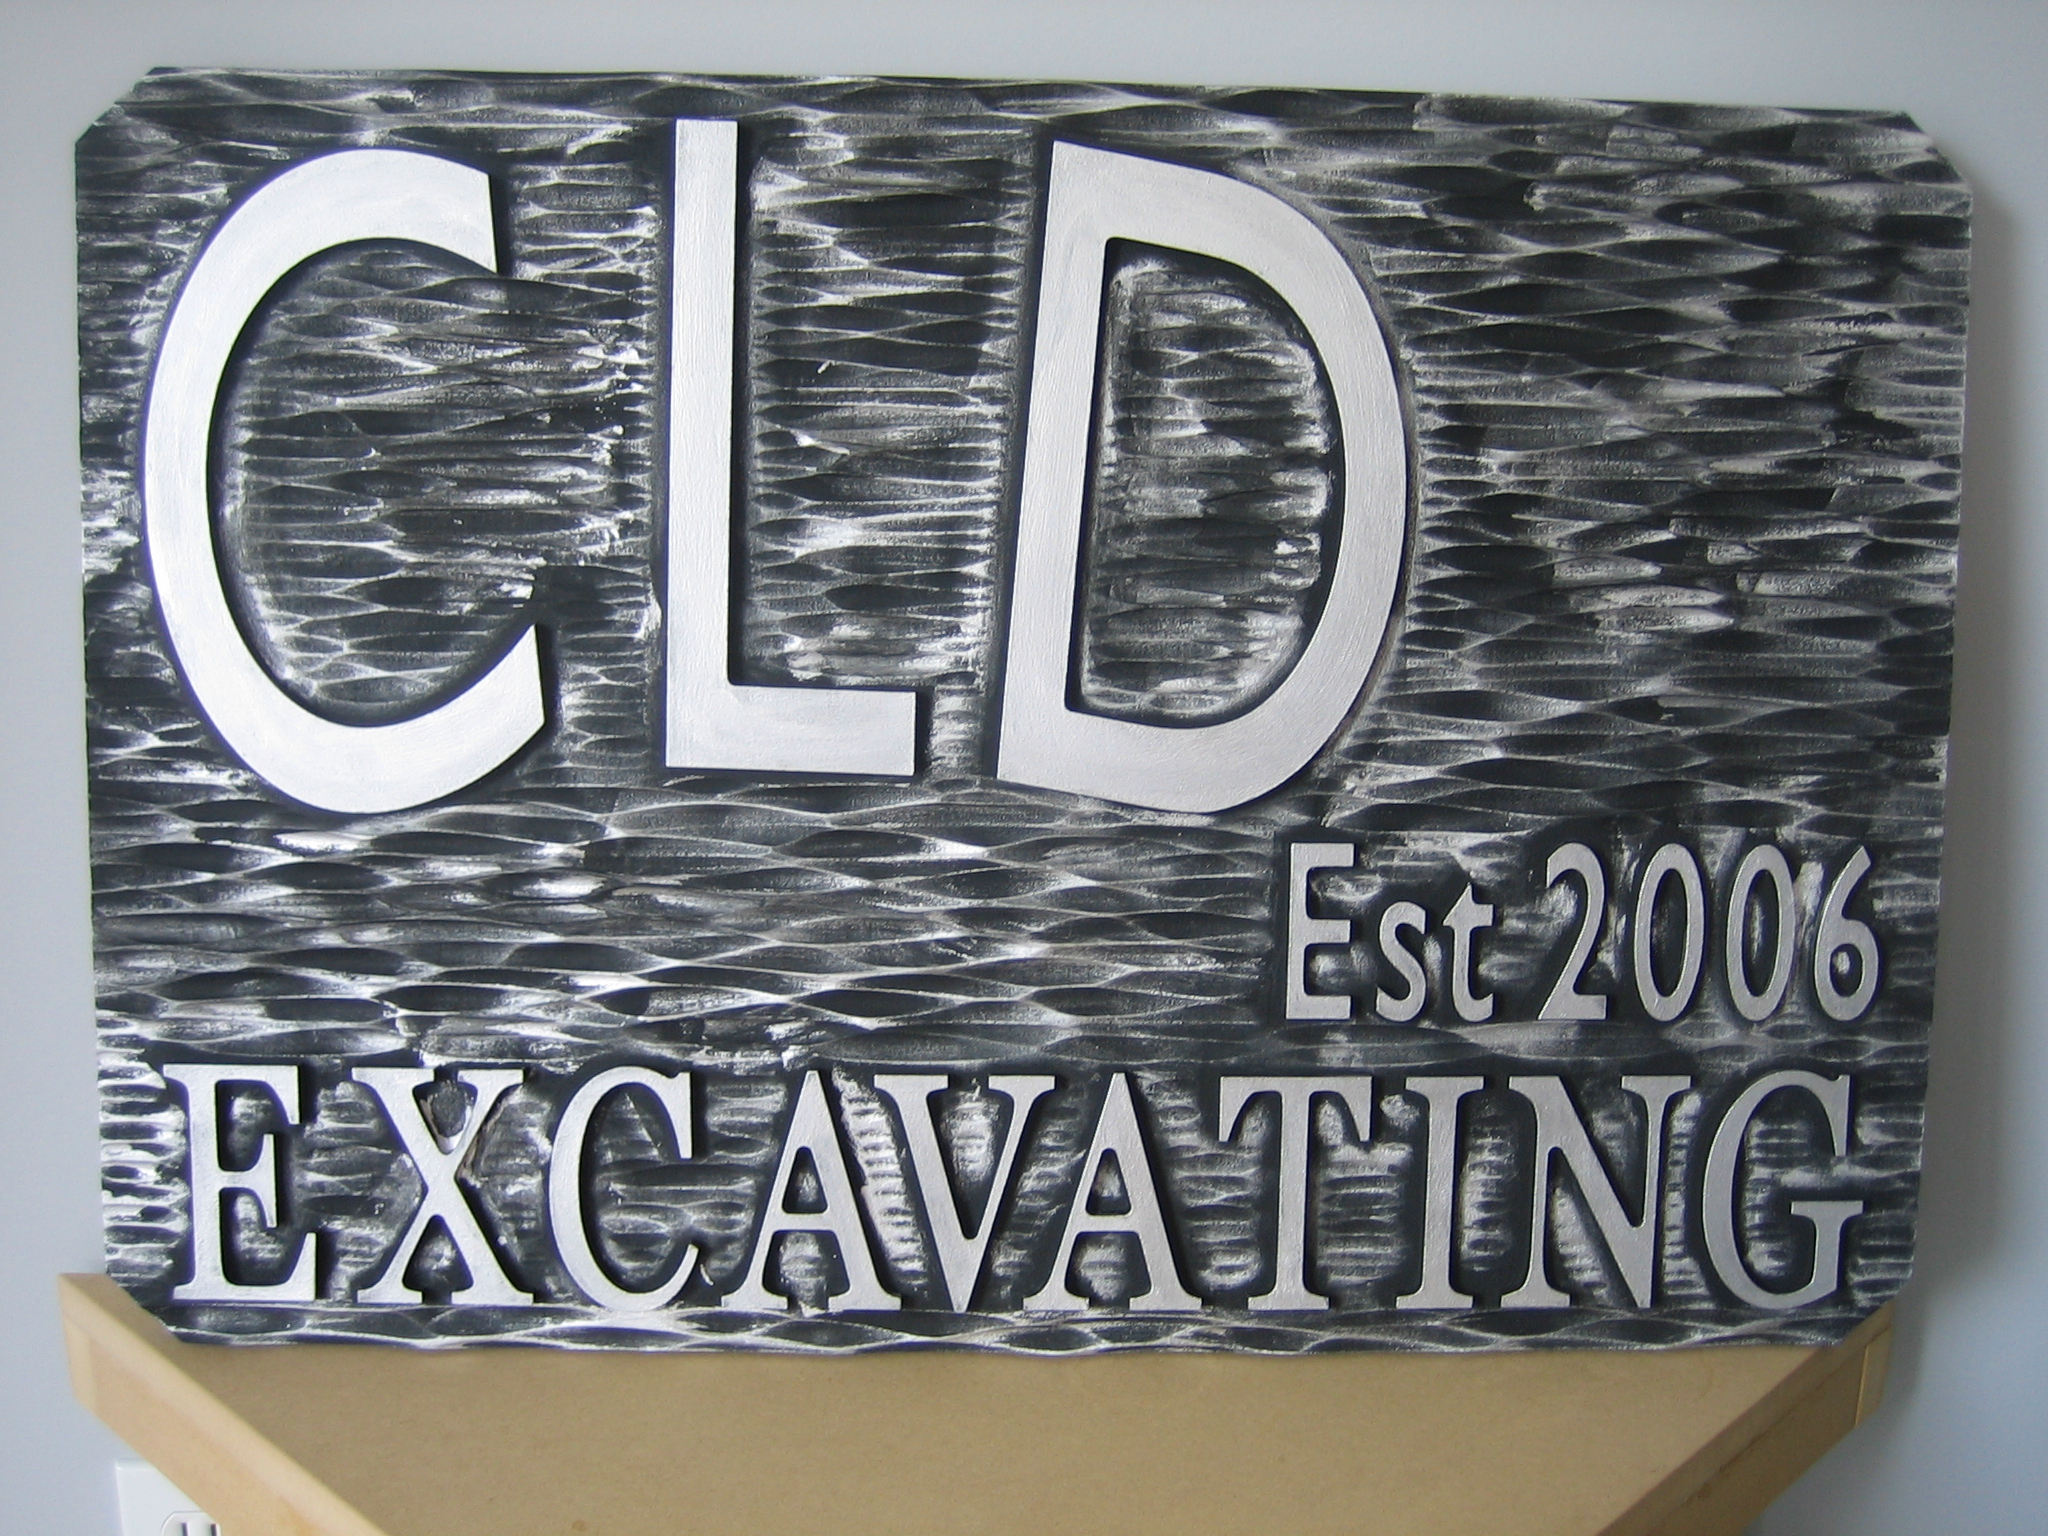 CLD Excavating